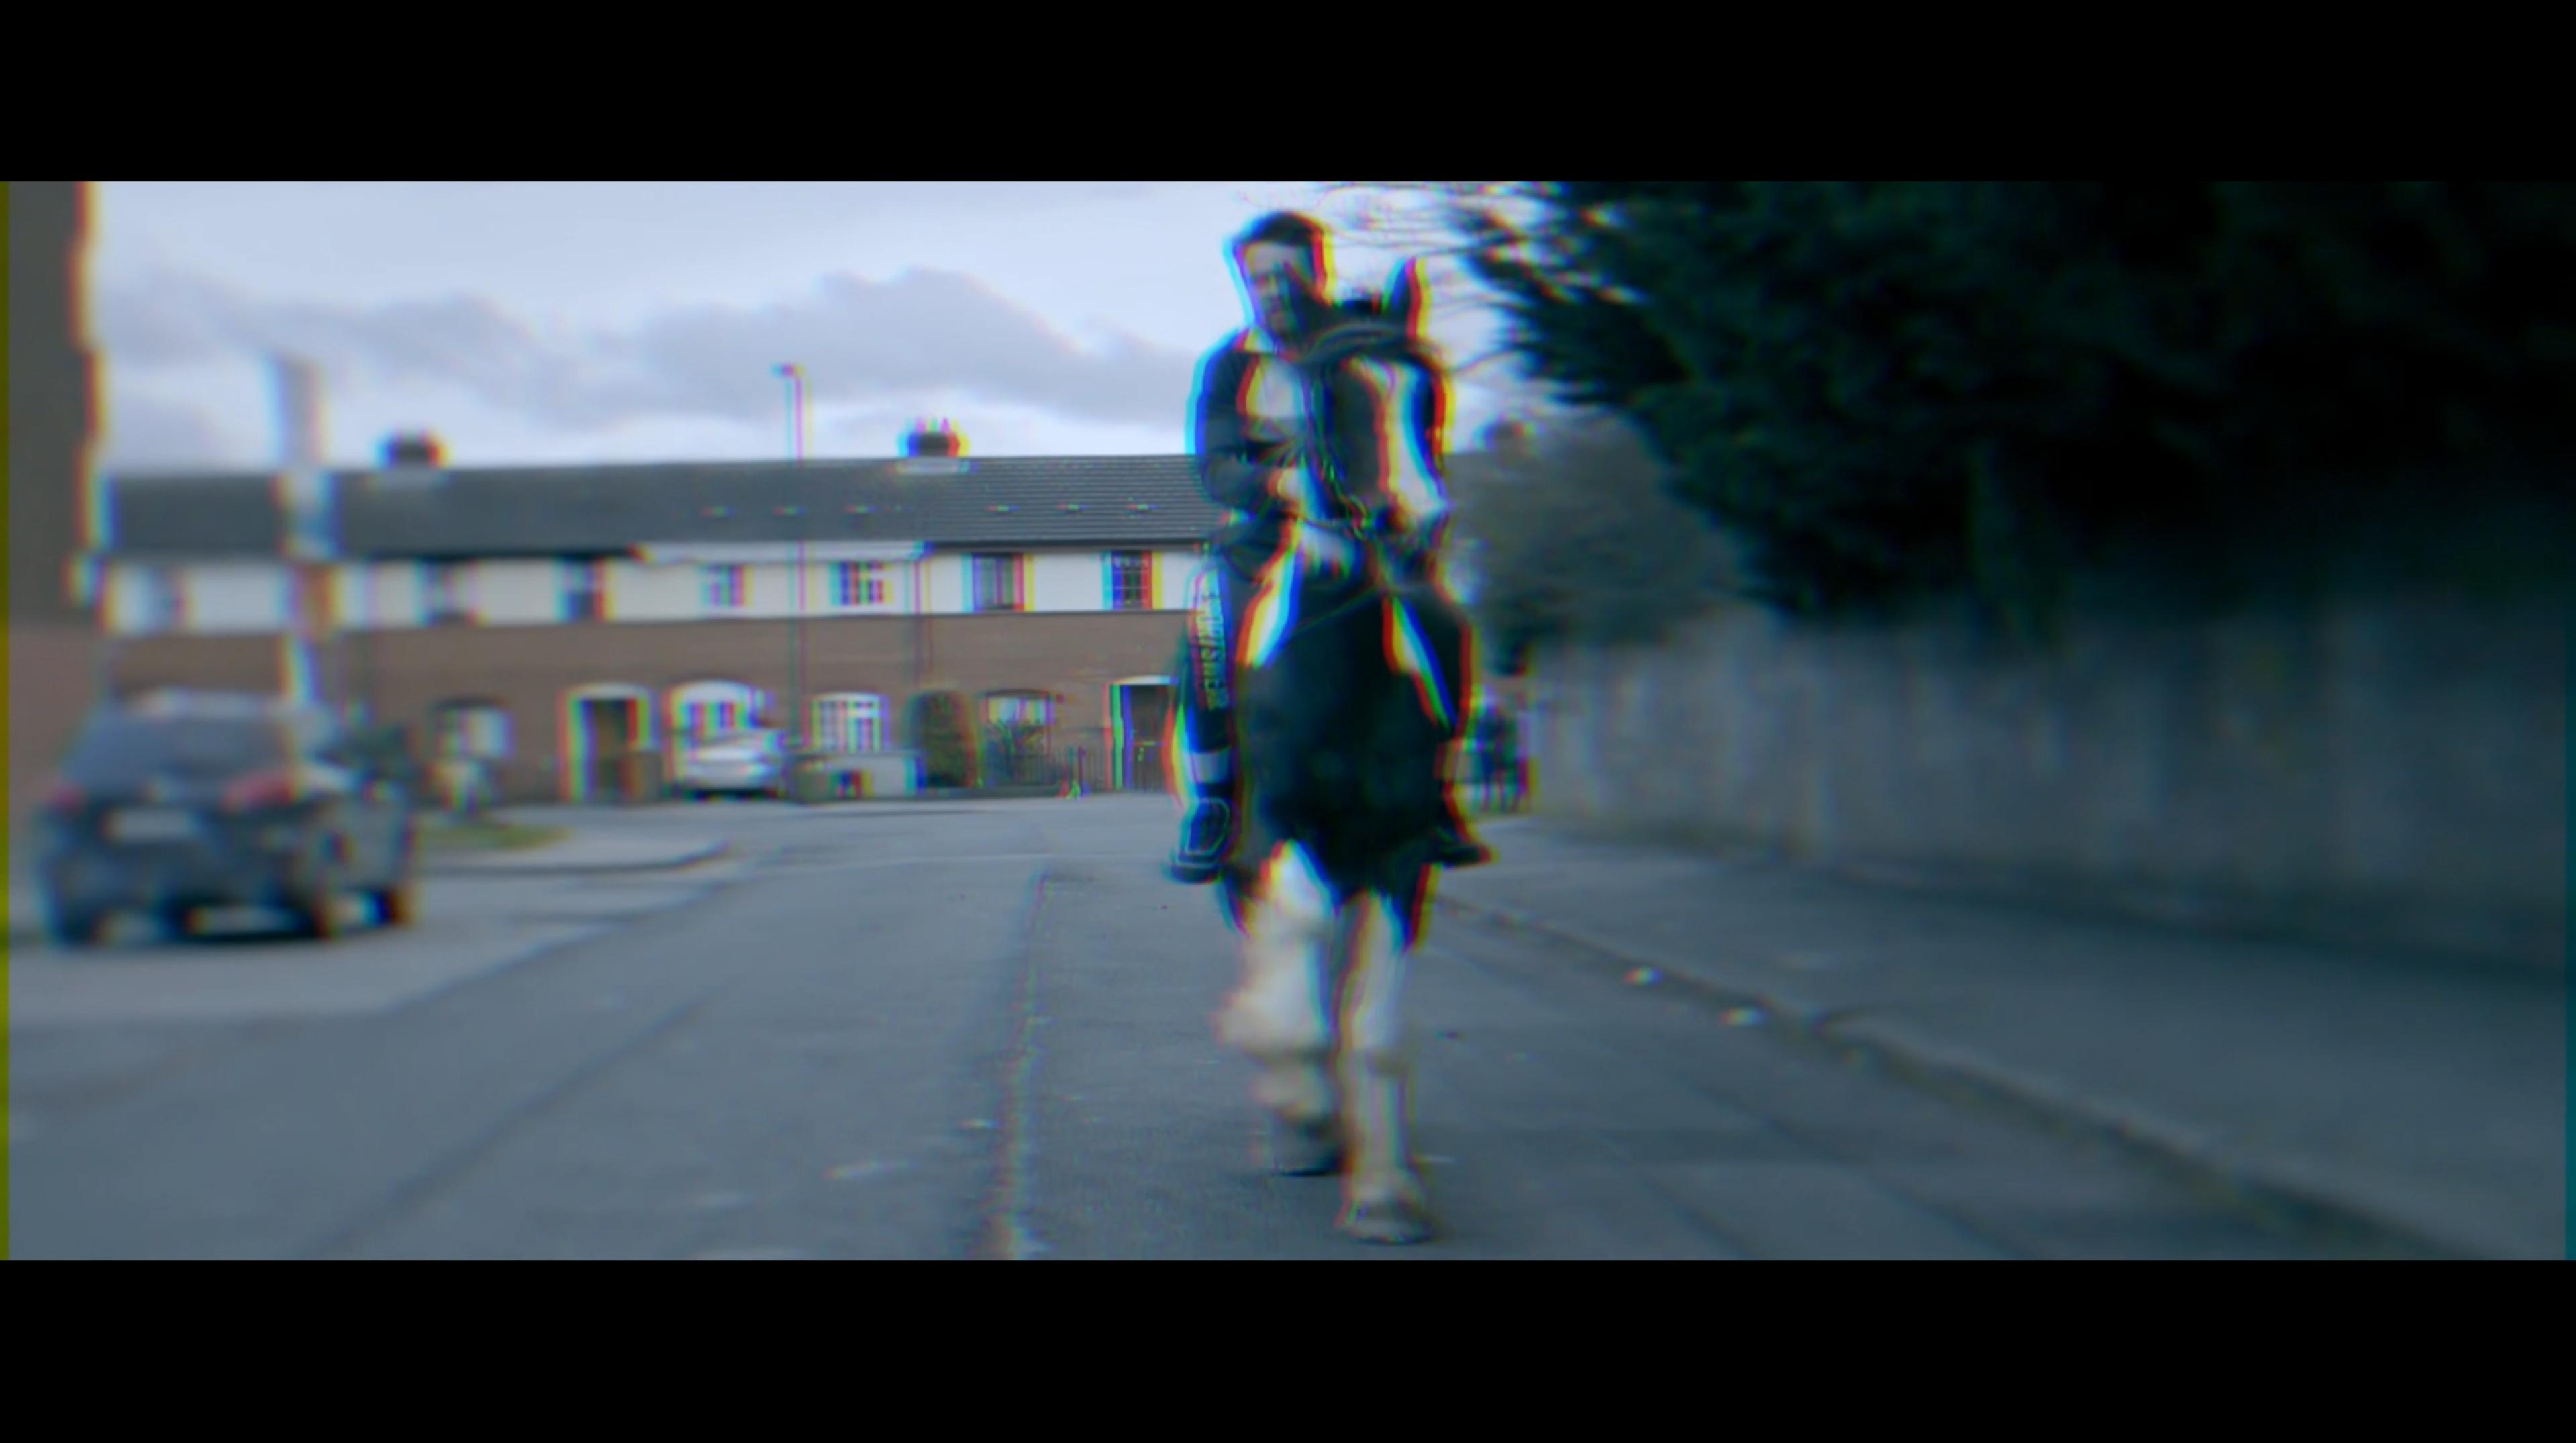 https://player.vimeo.com/video/323153841